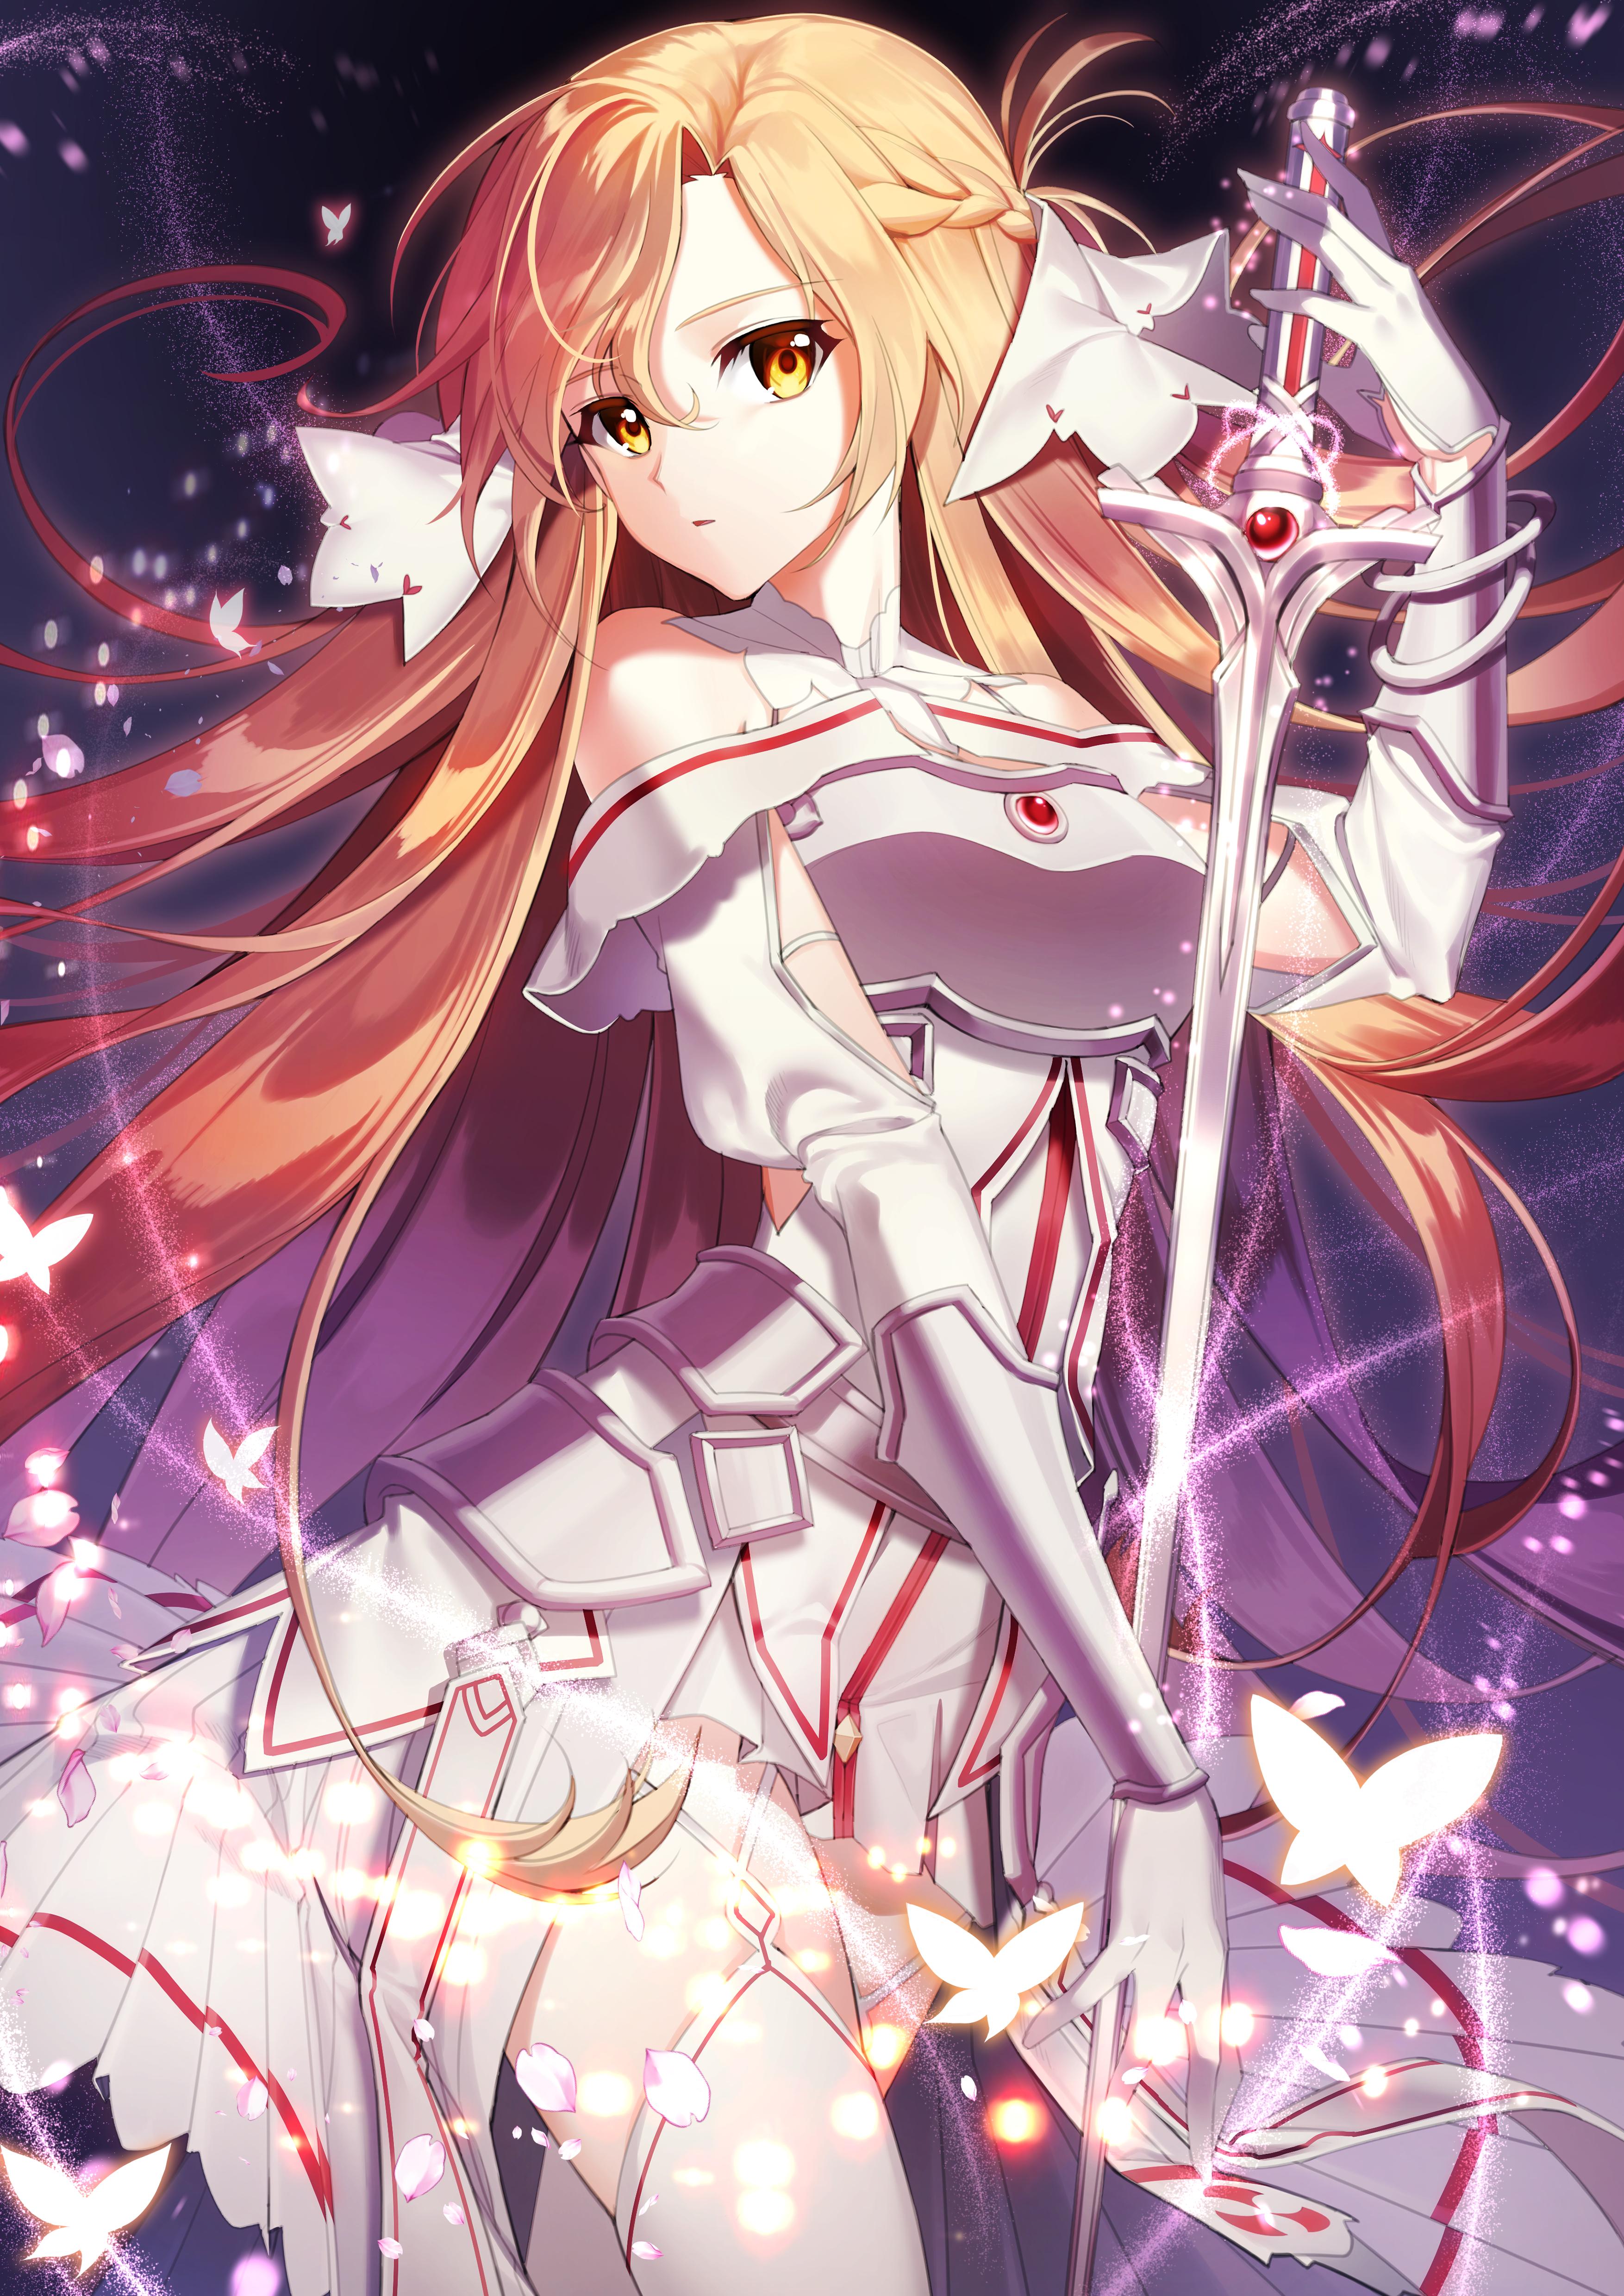 Stacia Pa Yuuki Asuna Image 2733864 Zerochan Anime Image Board